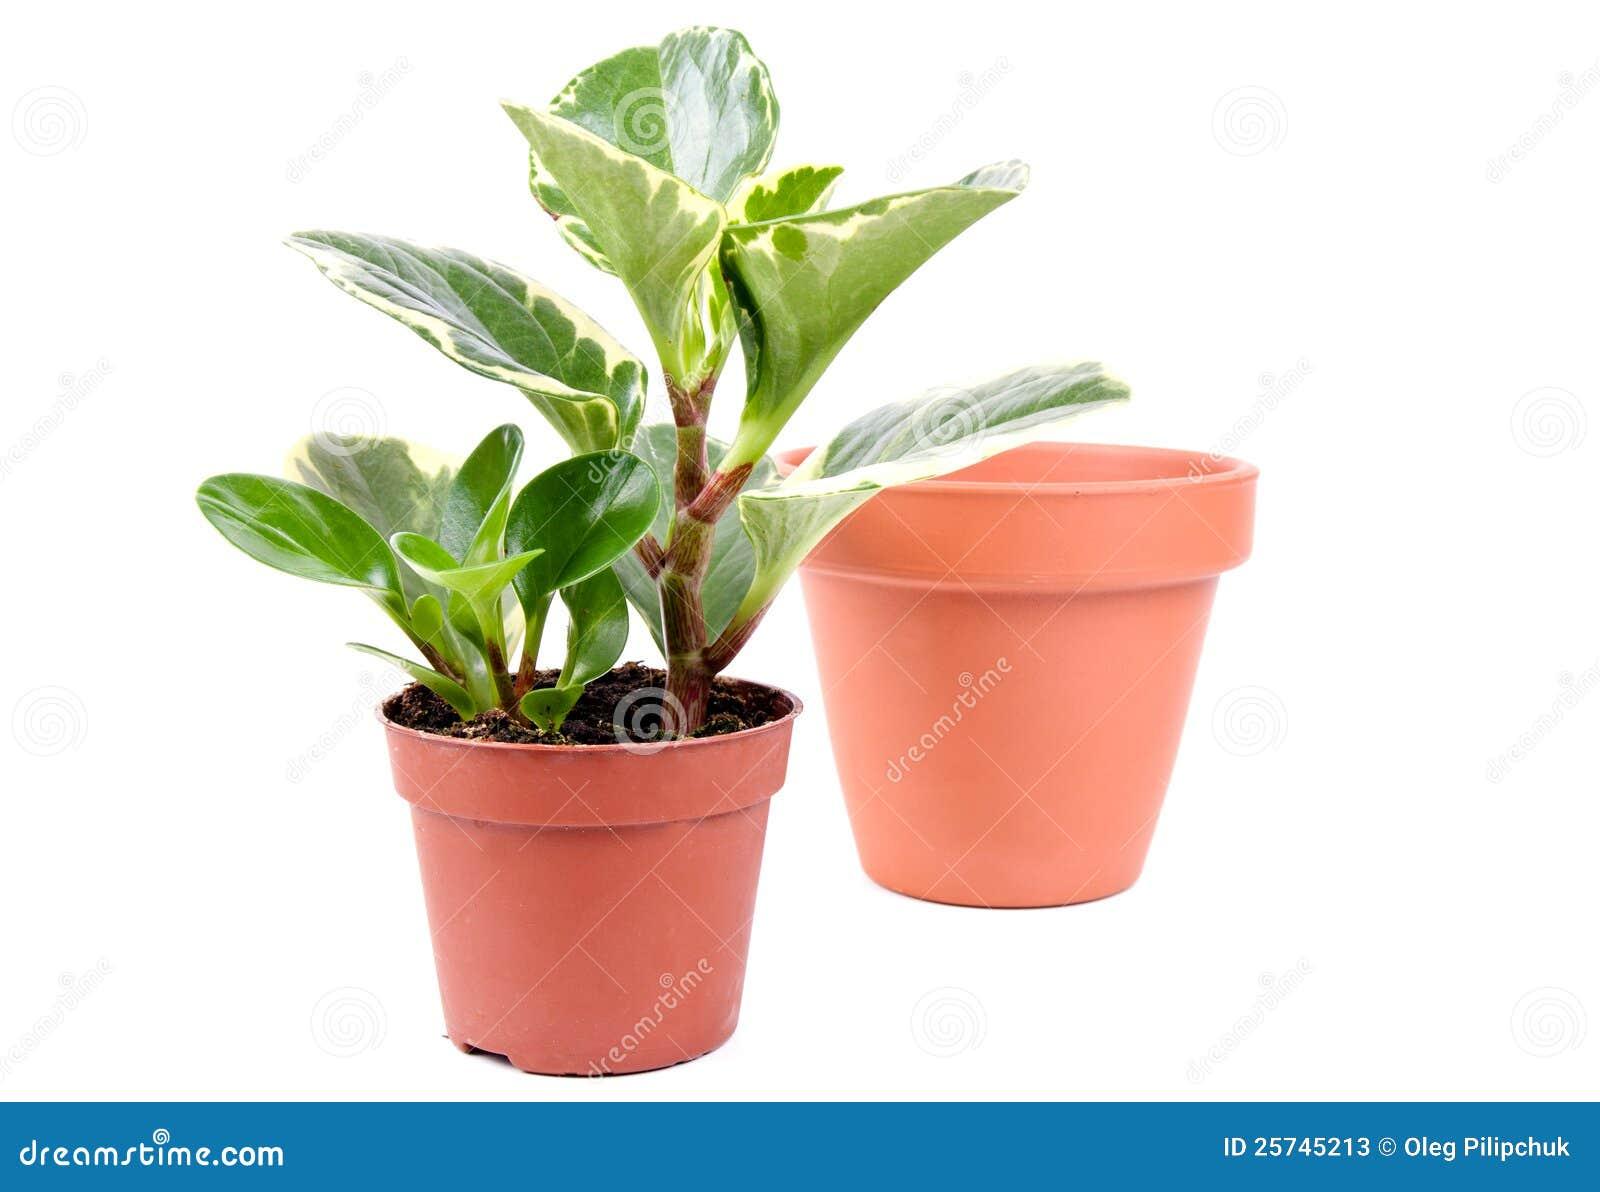 Plant in ceramic flower pot